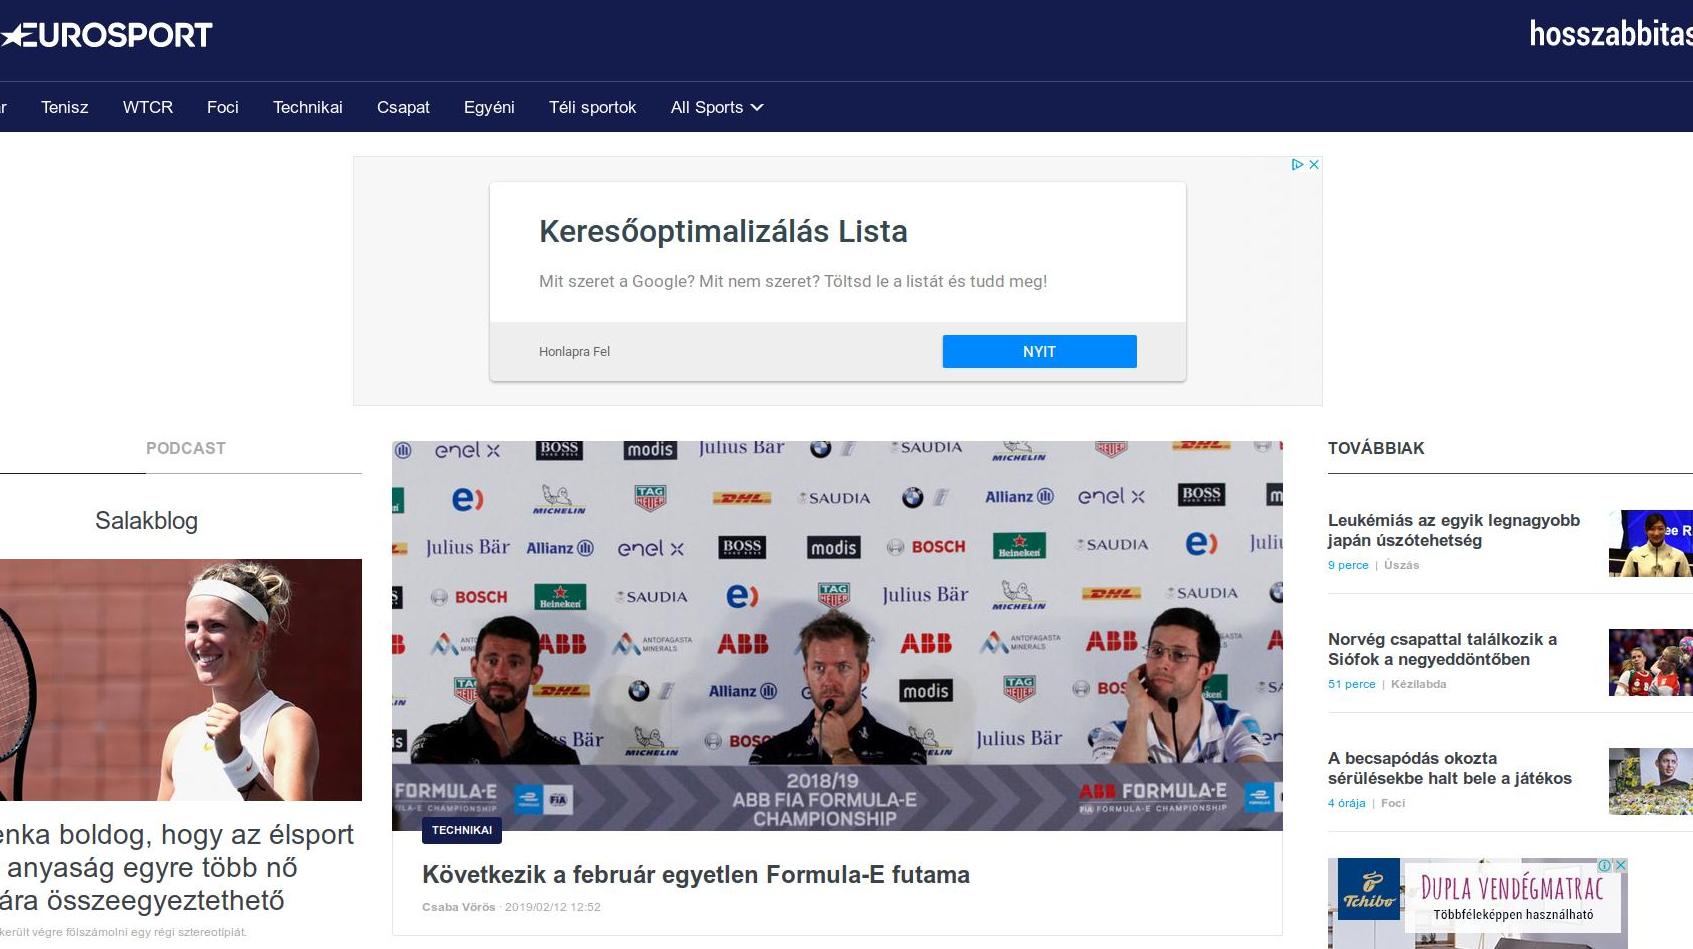 eurosport.hosszabbitas.hu